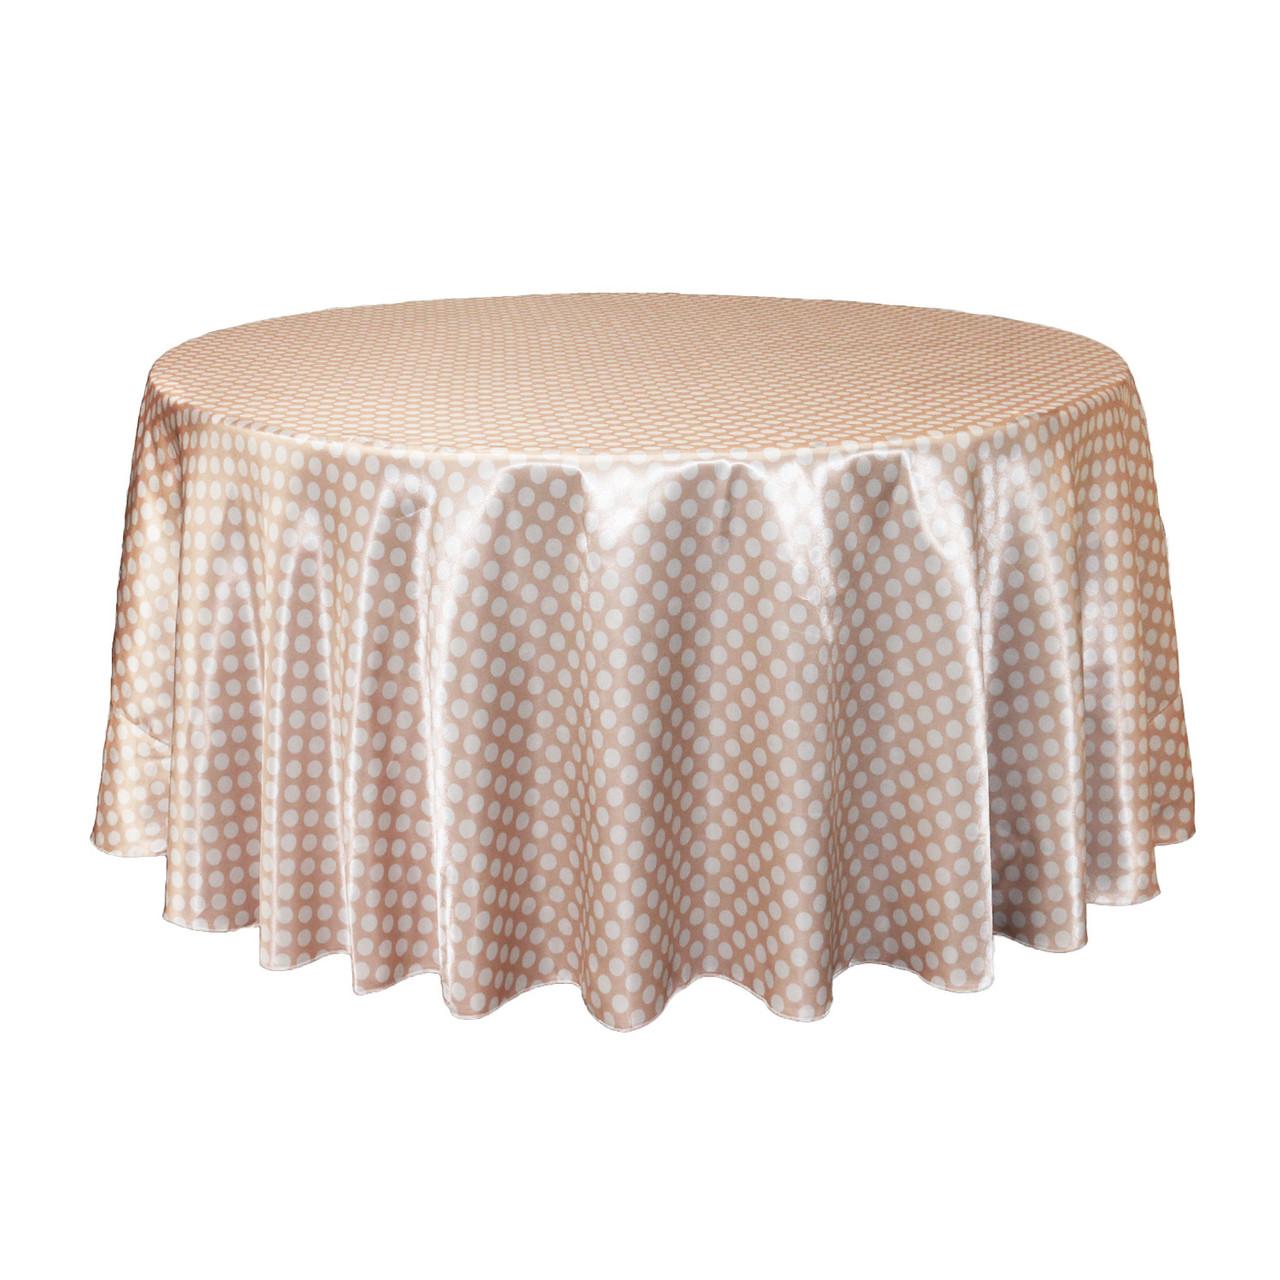 Awe Inspiring 120 Inch Round Satin Tablecloth Peach White Polka Dots Interior Design Ideas Gentotryabchikinfo